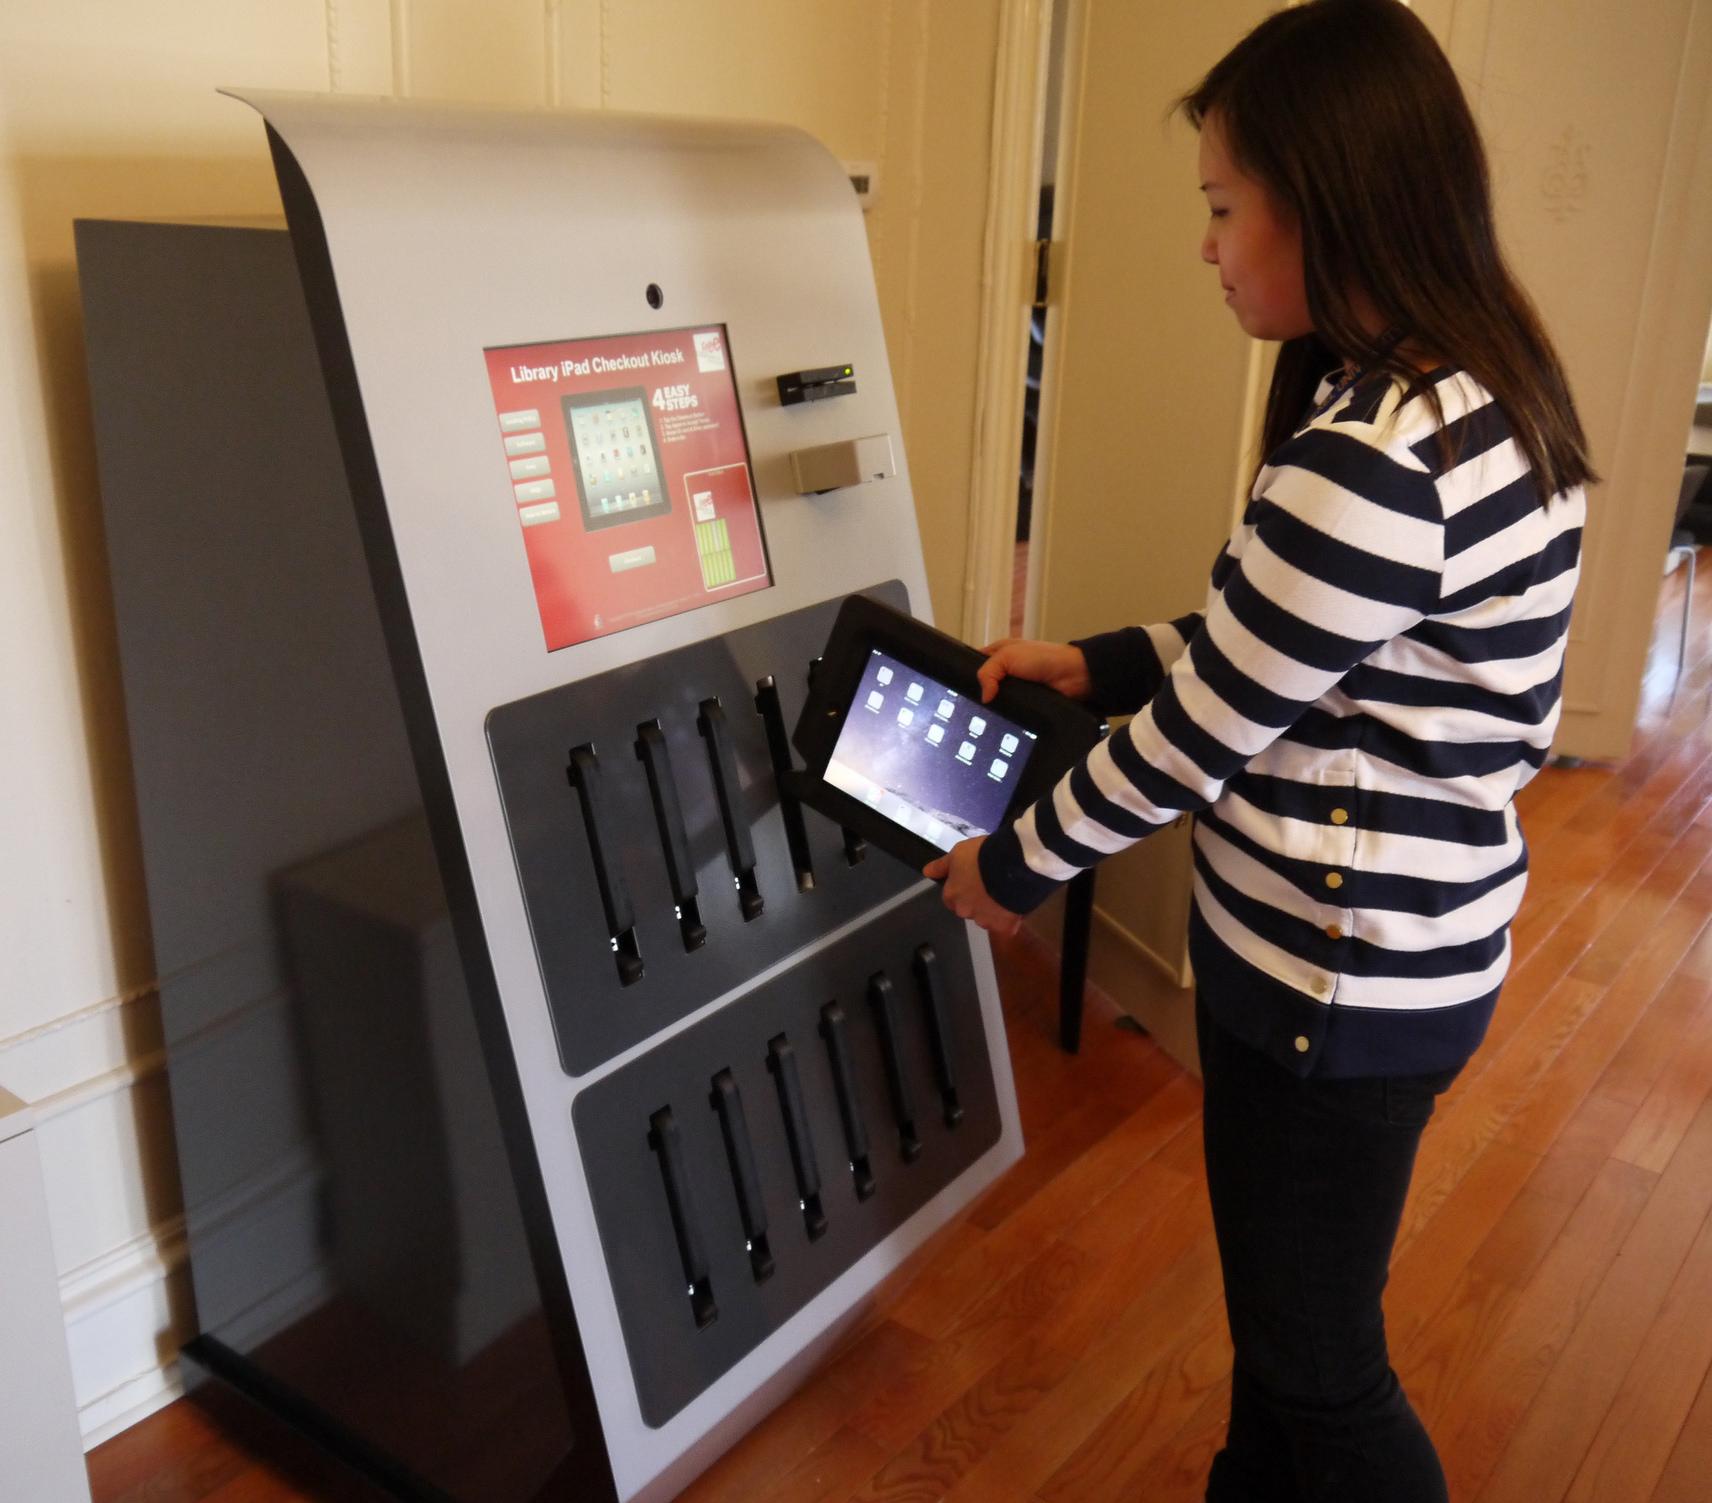 Automat iPad librarile Drexler